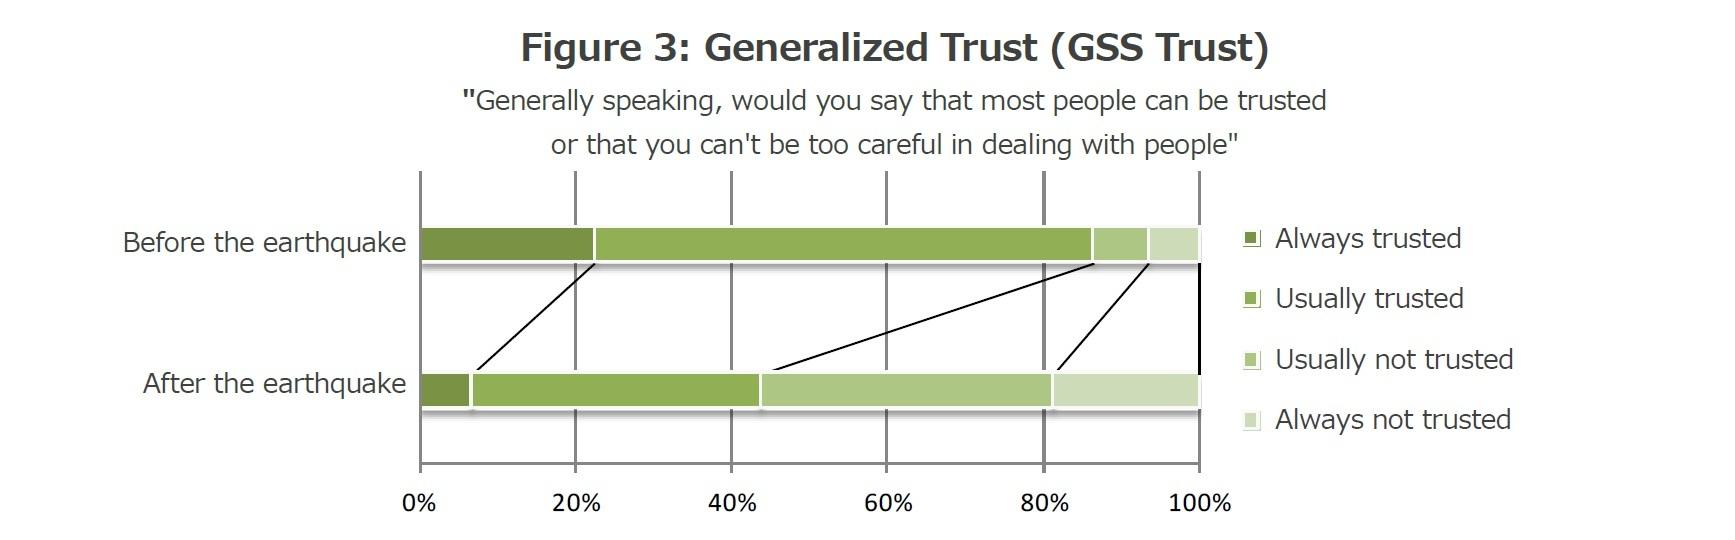 Figure 3: Generalized Trust (GSS Trust)